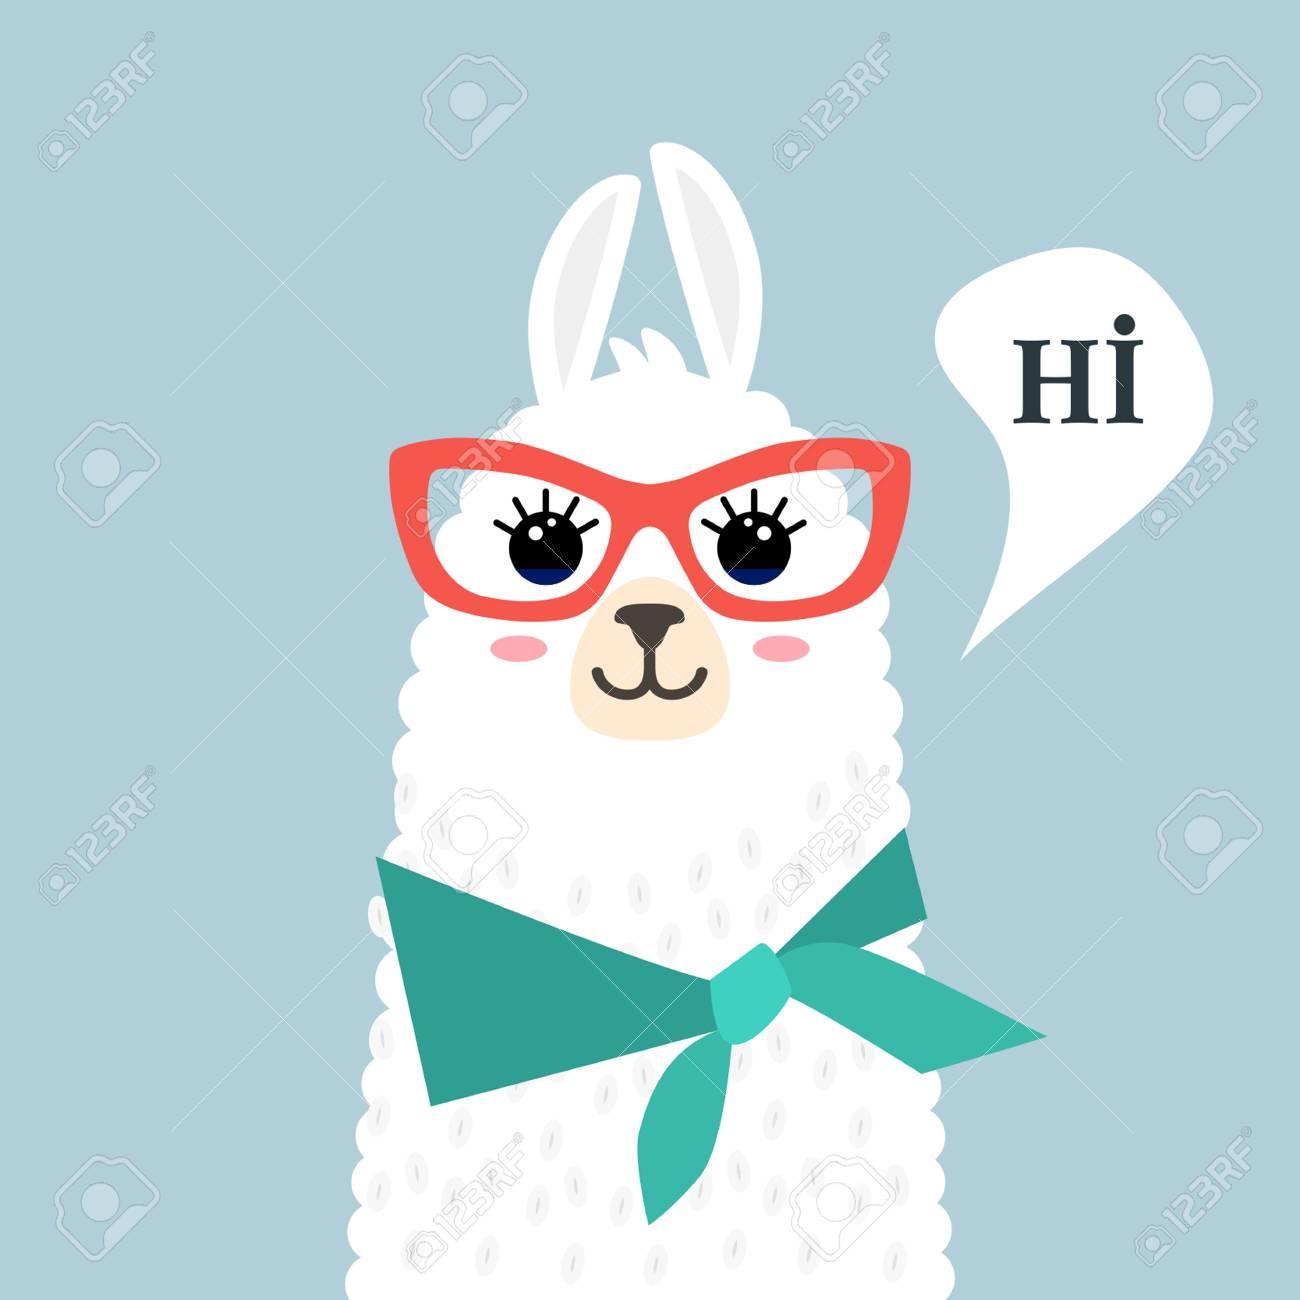 funny muzzle llama alpaca and greeting hi template for print